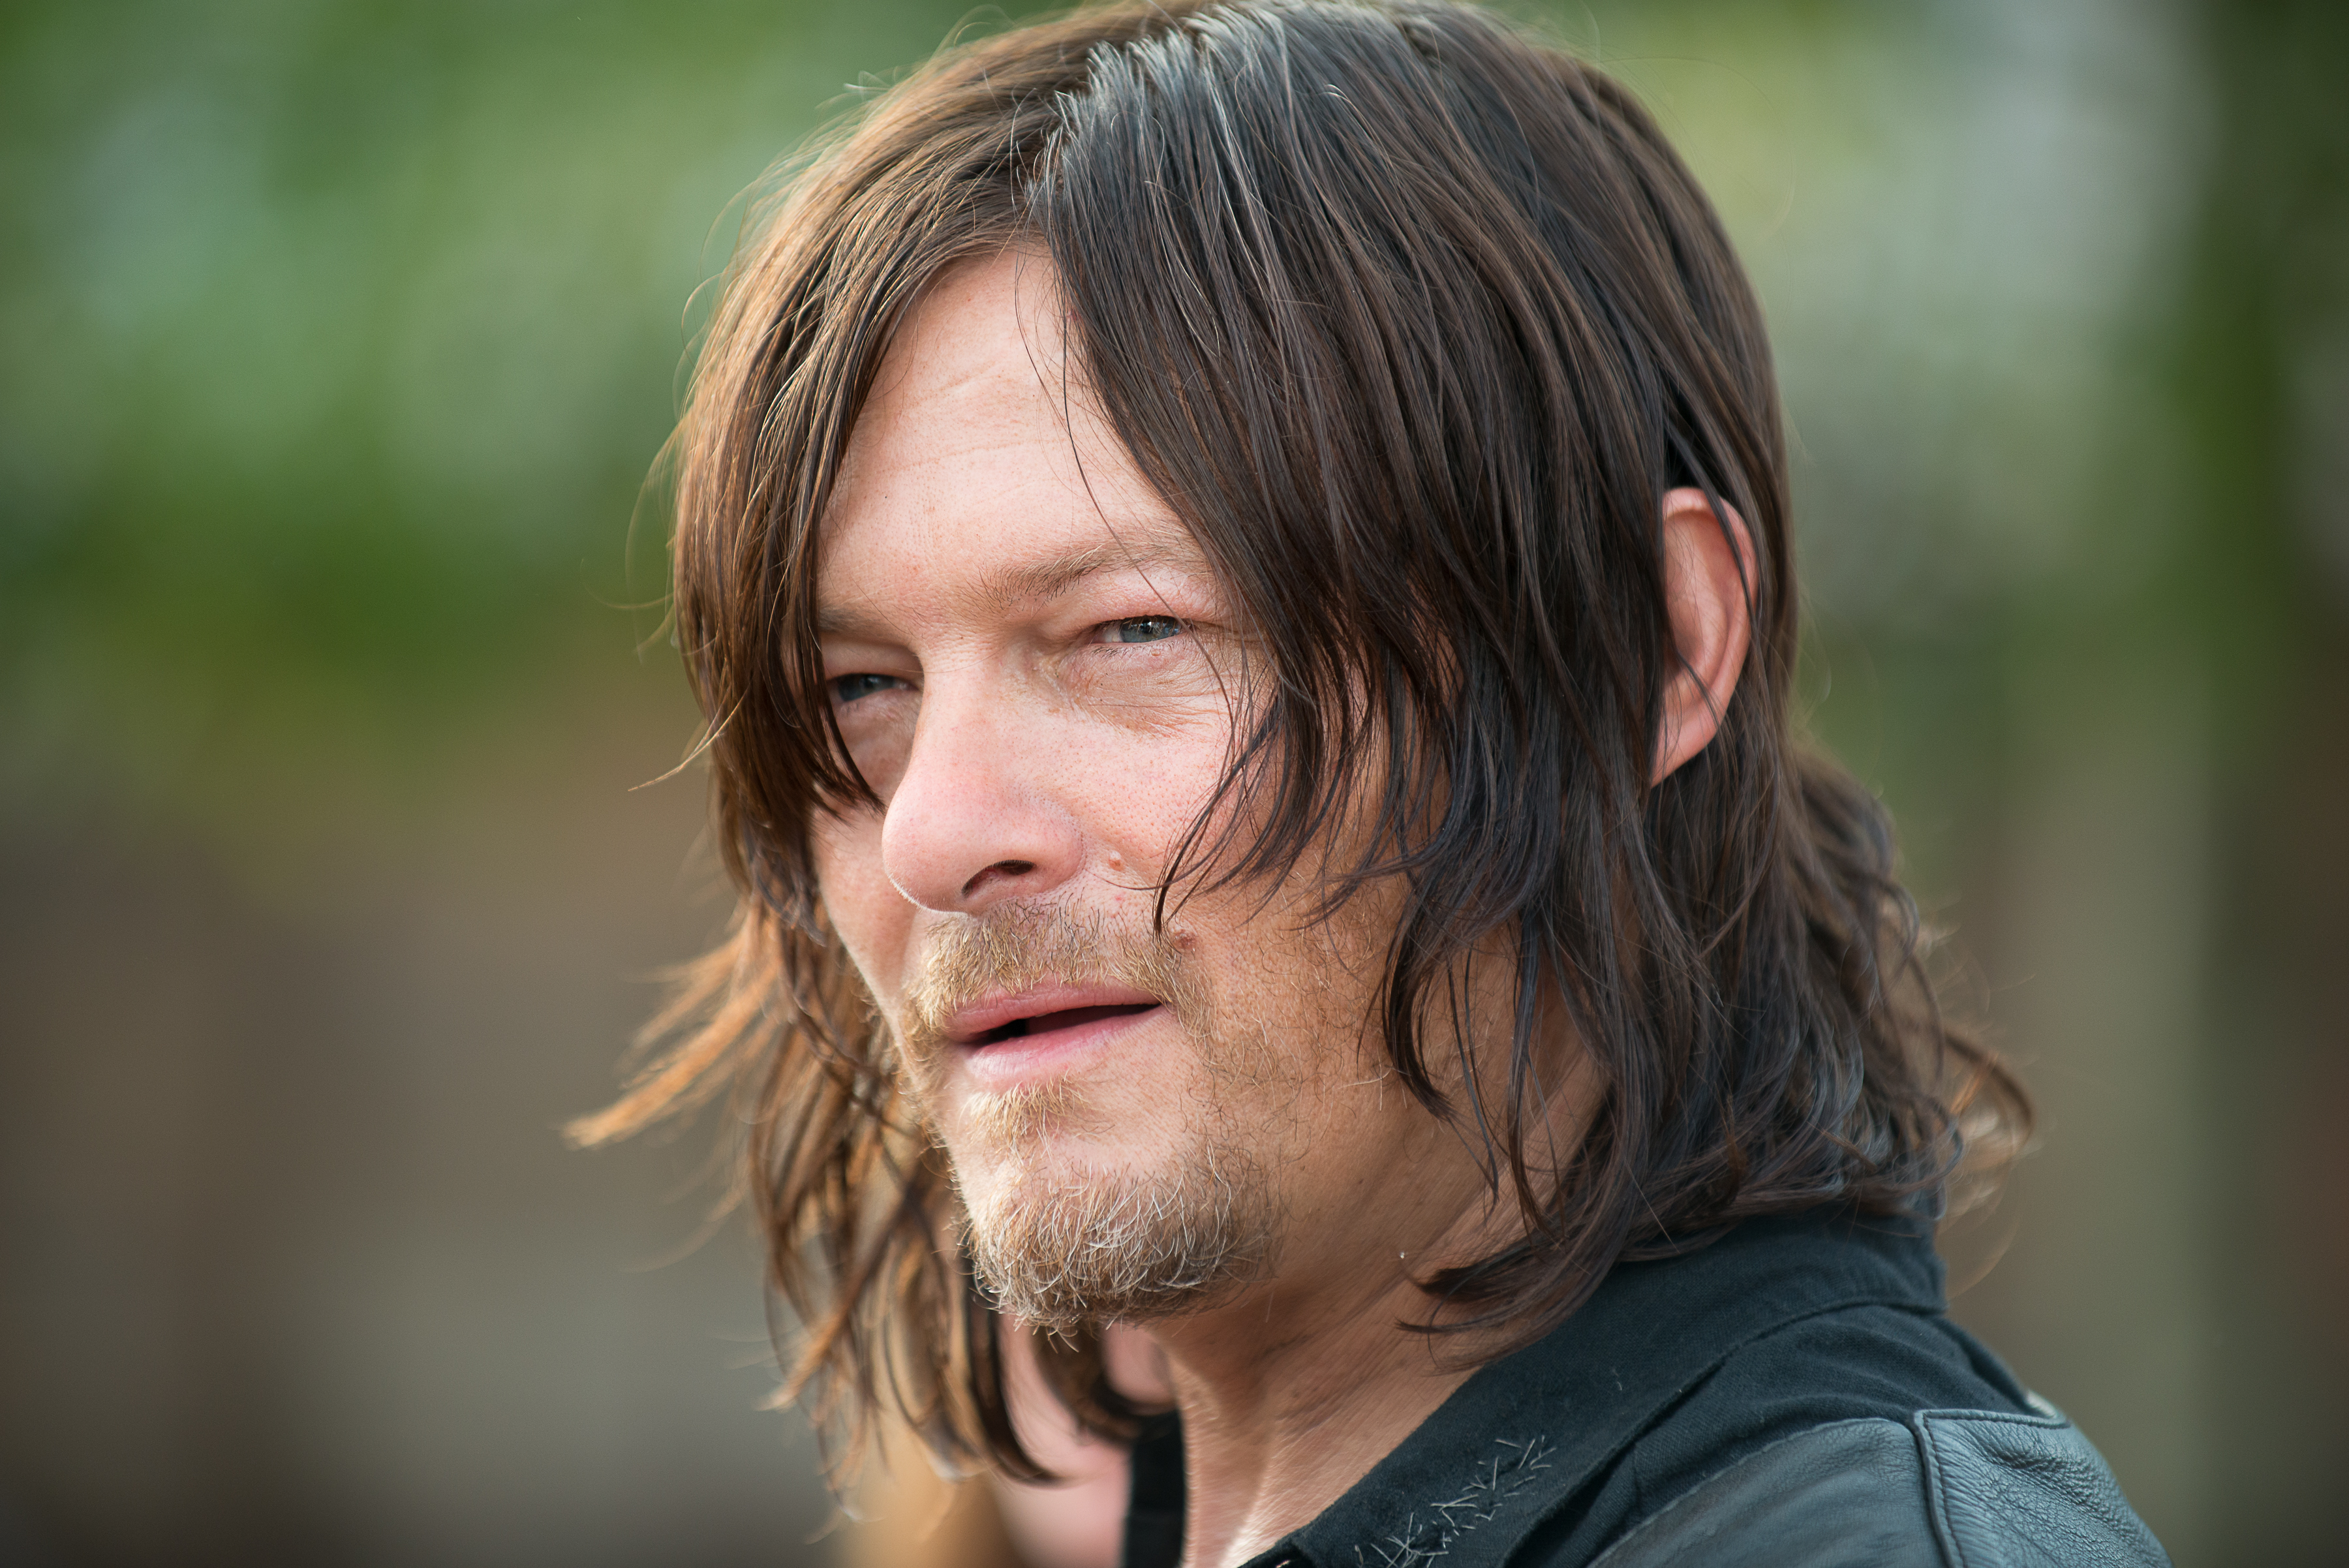 Norman Reedus als Daryl Dixon - The Walking Dead, Season 6, Episode 11© Gene Page/AMC